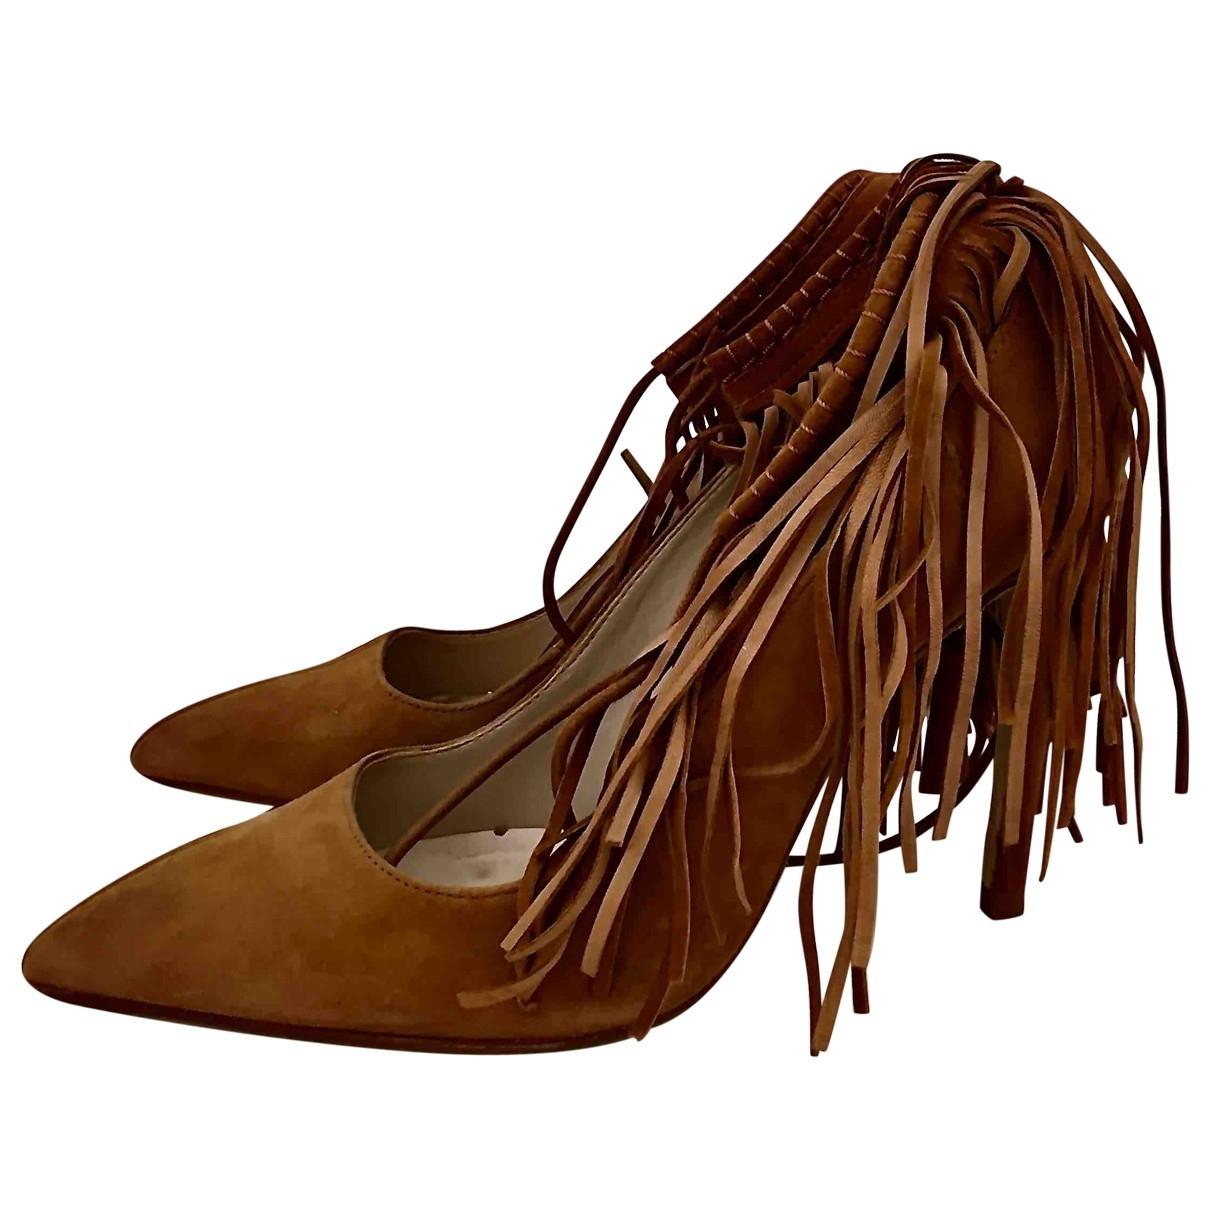 Zara - Escarpins   pour femme en suede - camel